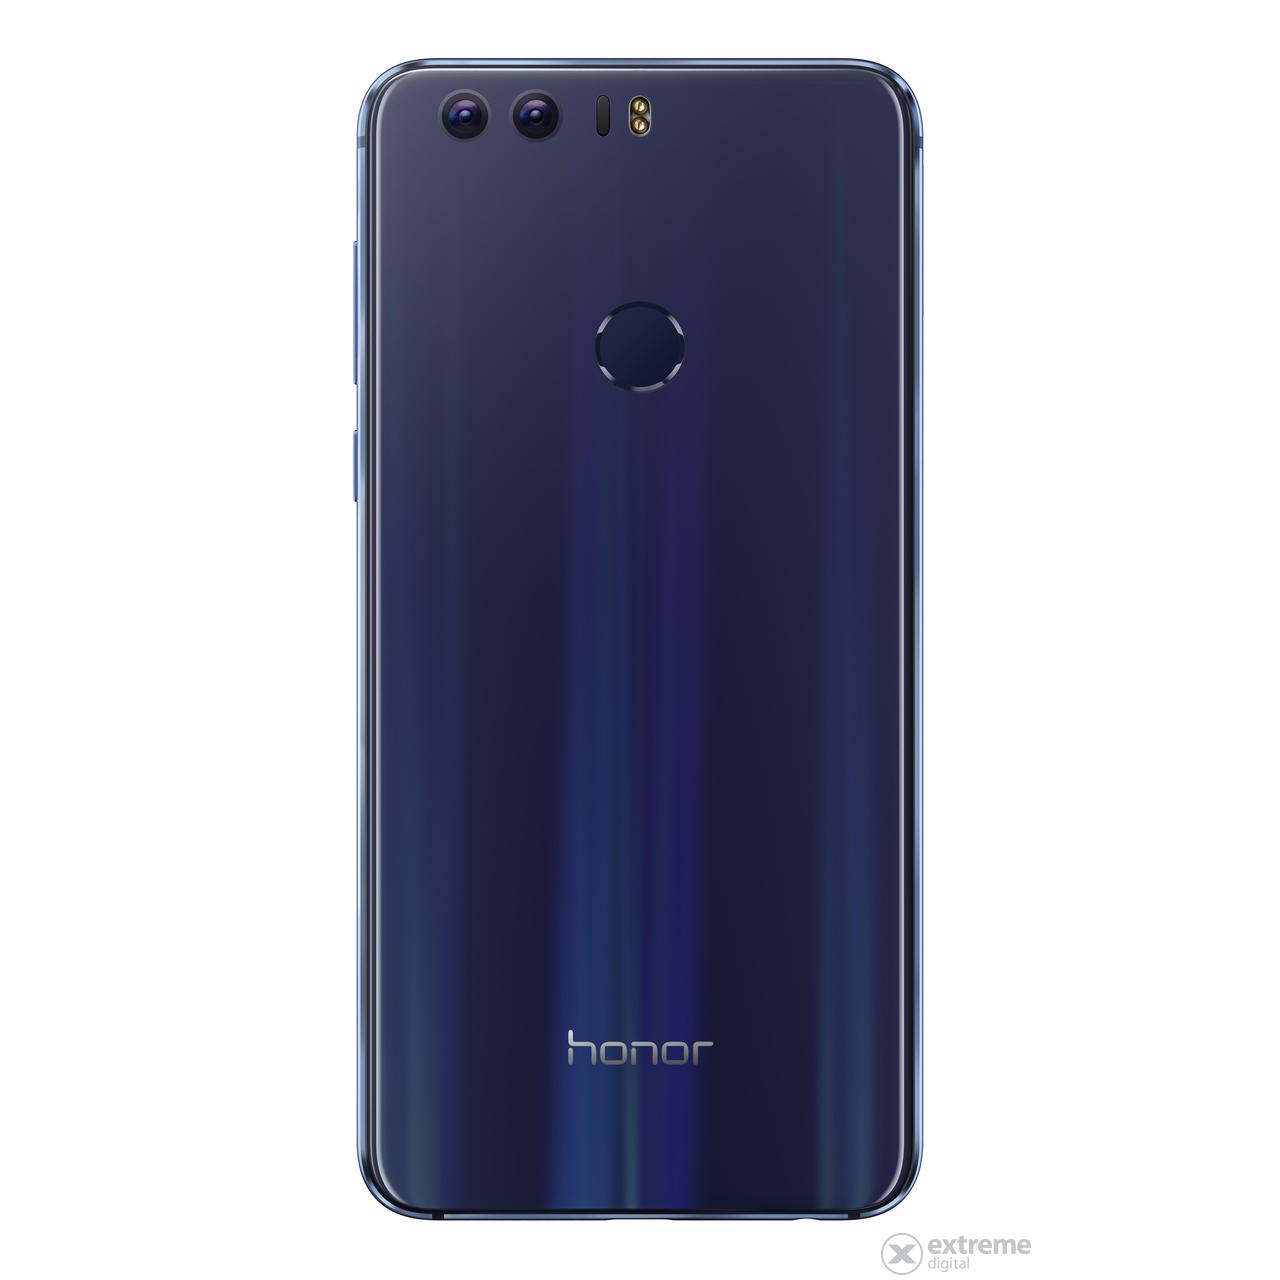 telefon honor 8 dual sim blue android extreme digital. Black Bedroom Furniture Sets. Home Design Ideas